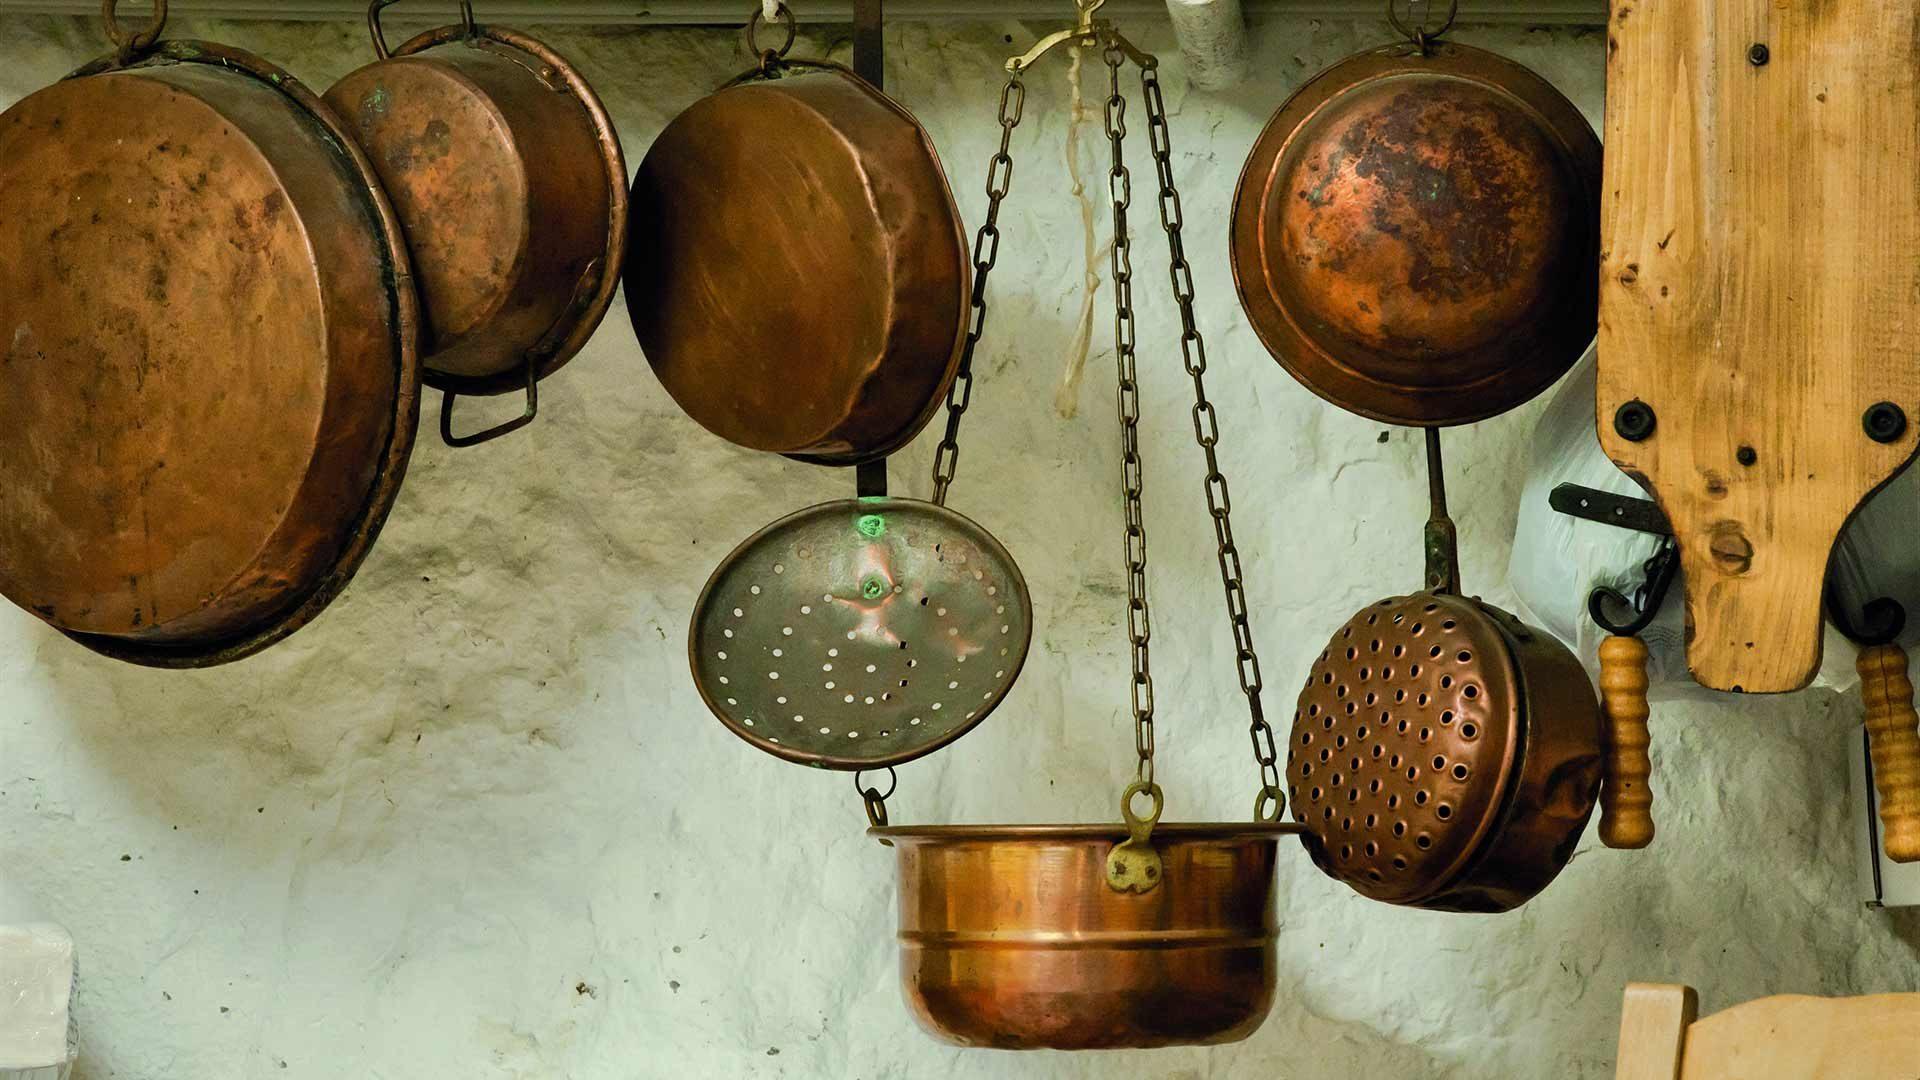 Cucina alpina a Parcines